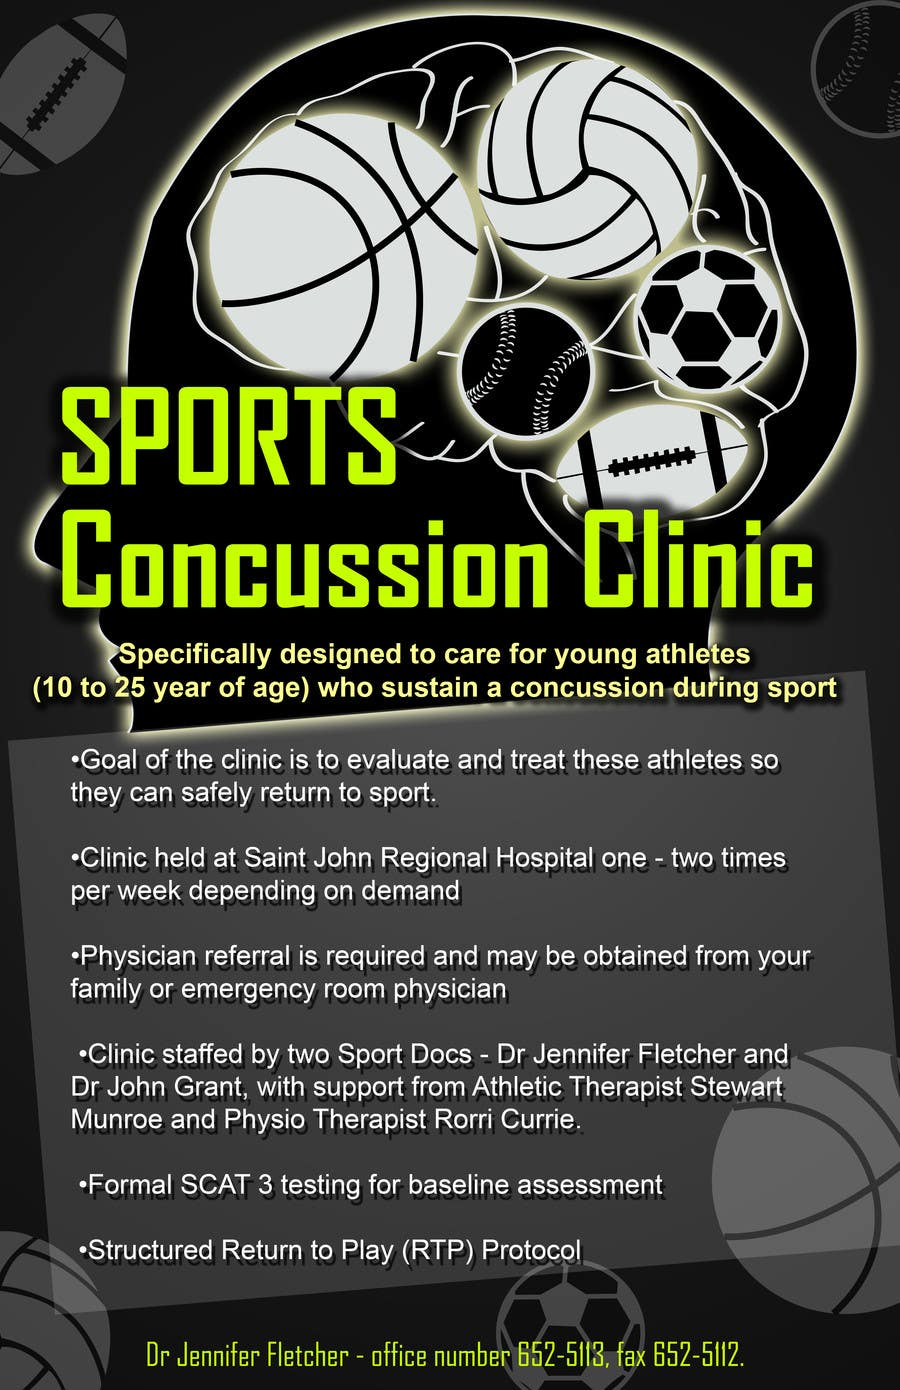 Bài tham dự cuộc thi #13 cho Design a Flyer for Sports Concussion Clinic